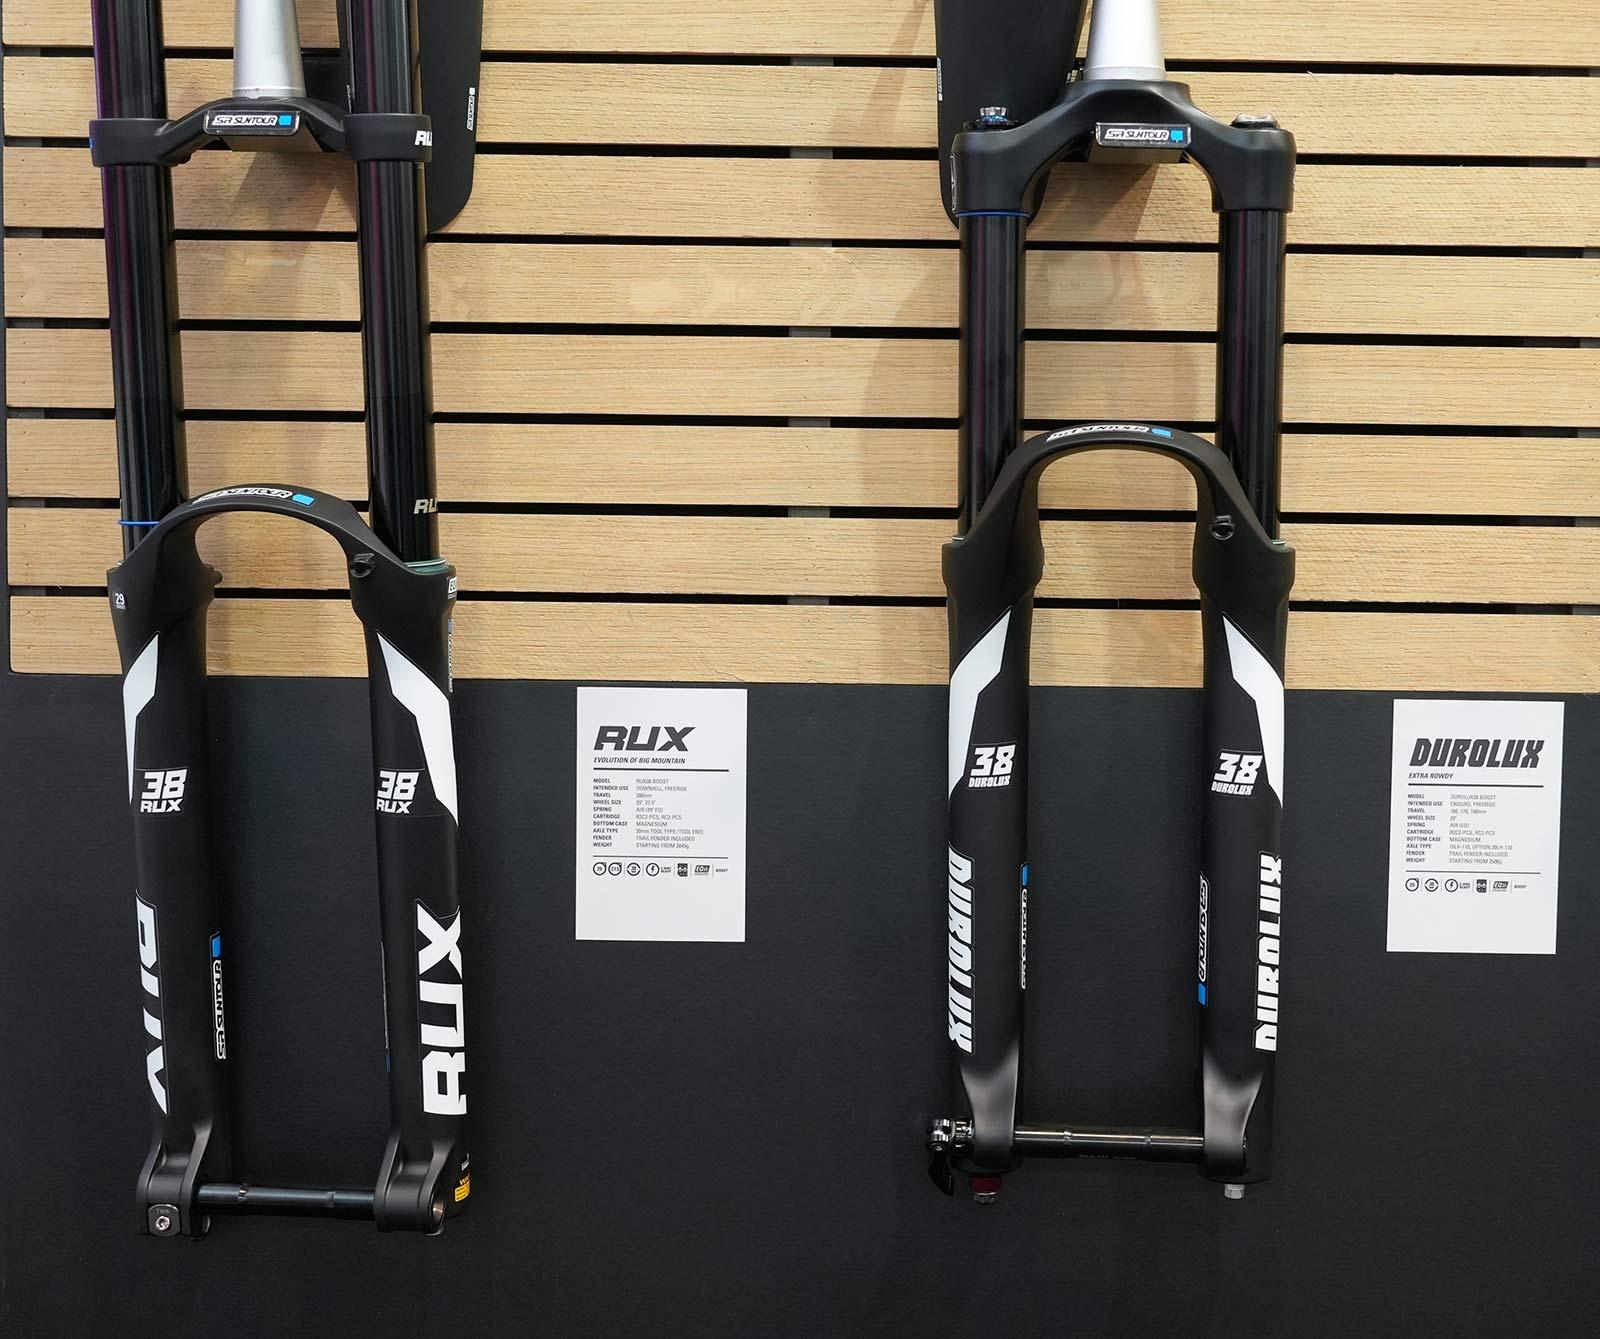 2022 SR Suntour Rux and Durolux enduro mountain bike suspension forks with 38mm stanchions